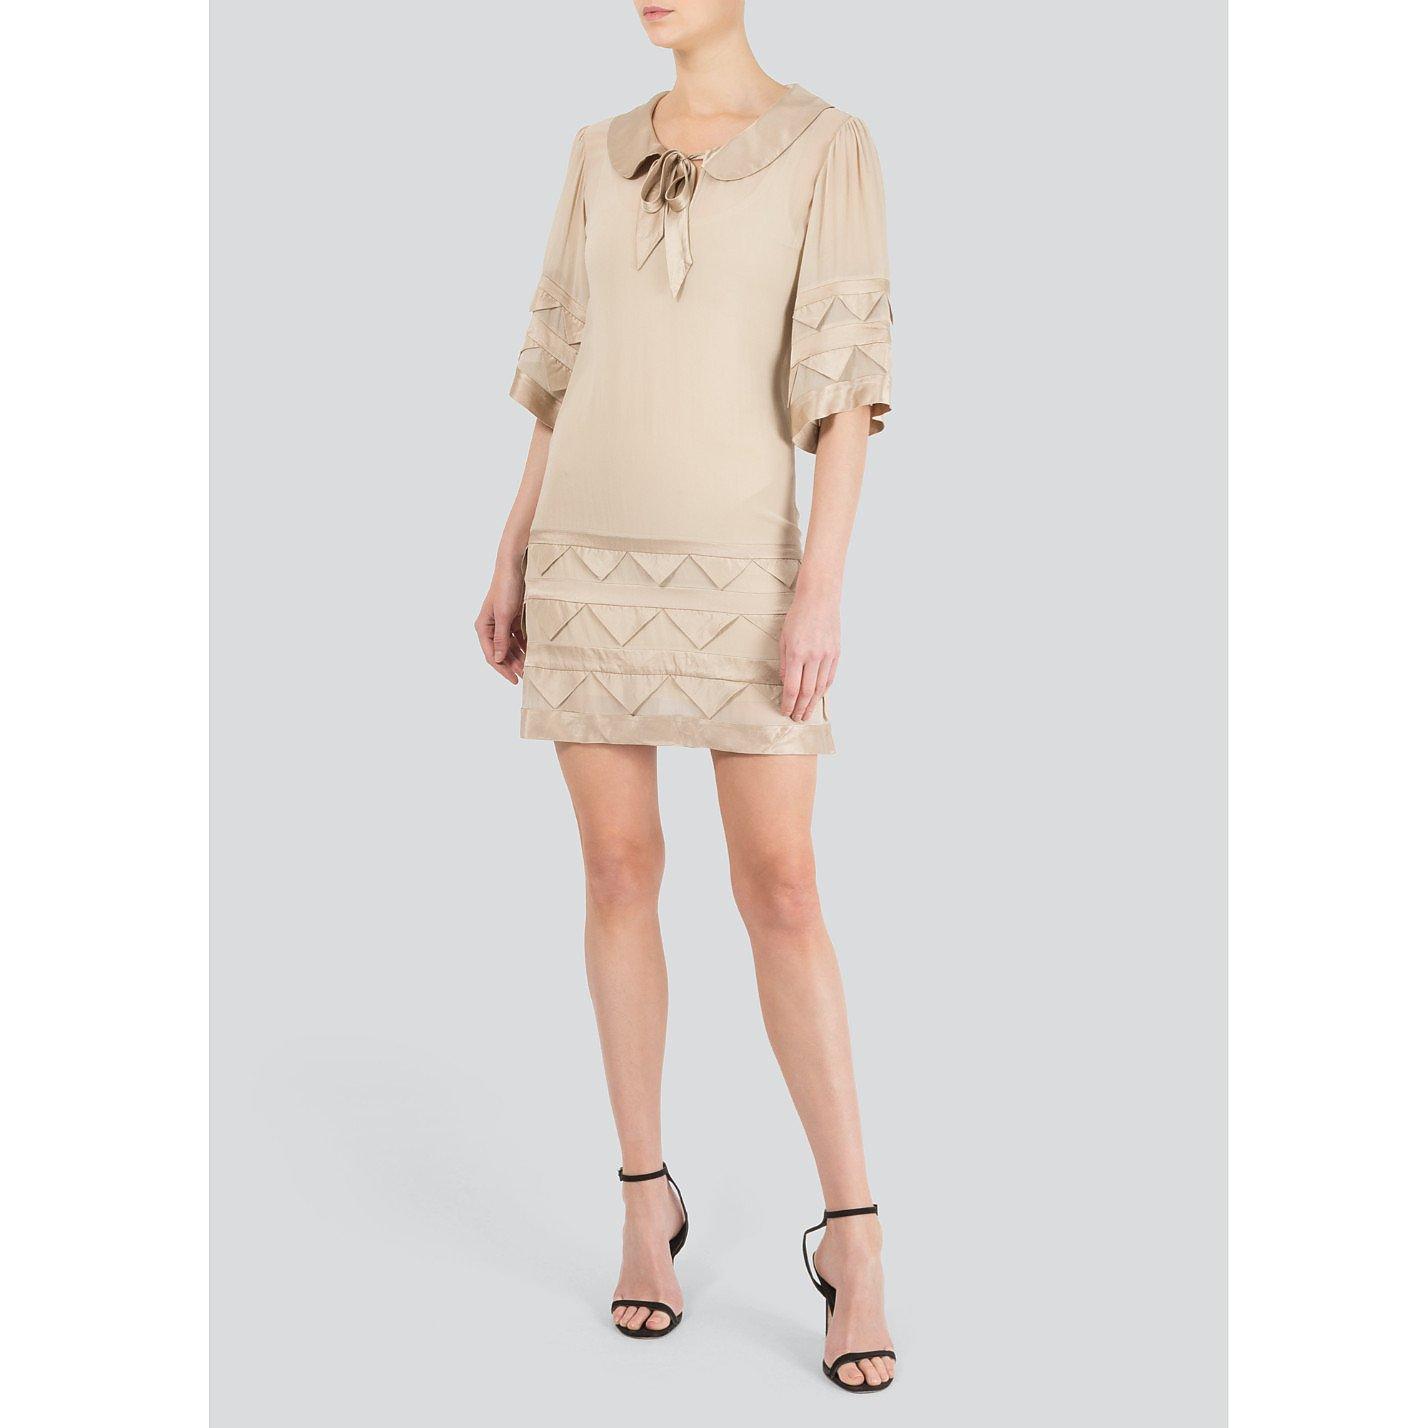 Temperley London Satin Applique Mini Dress